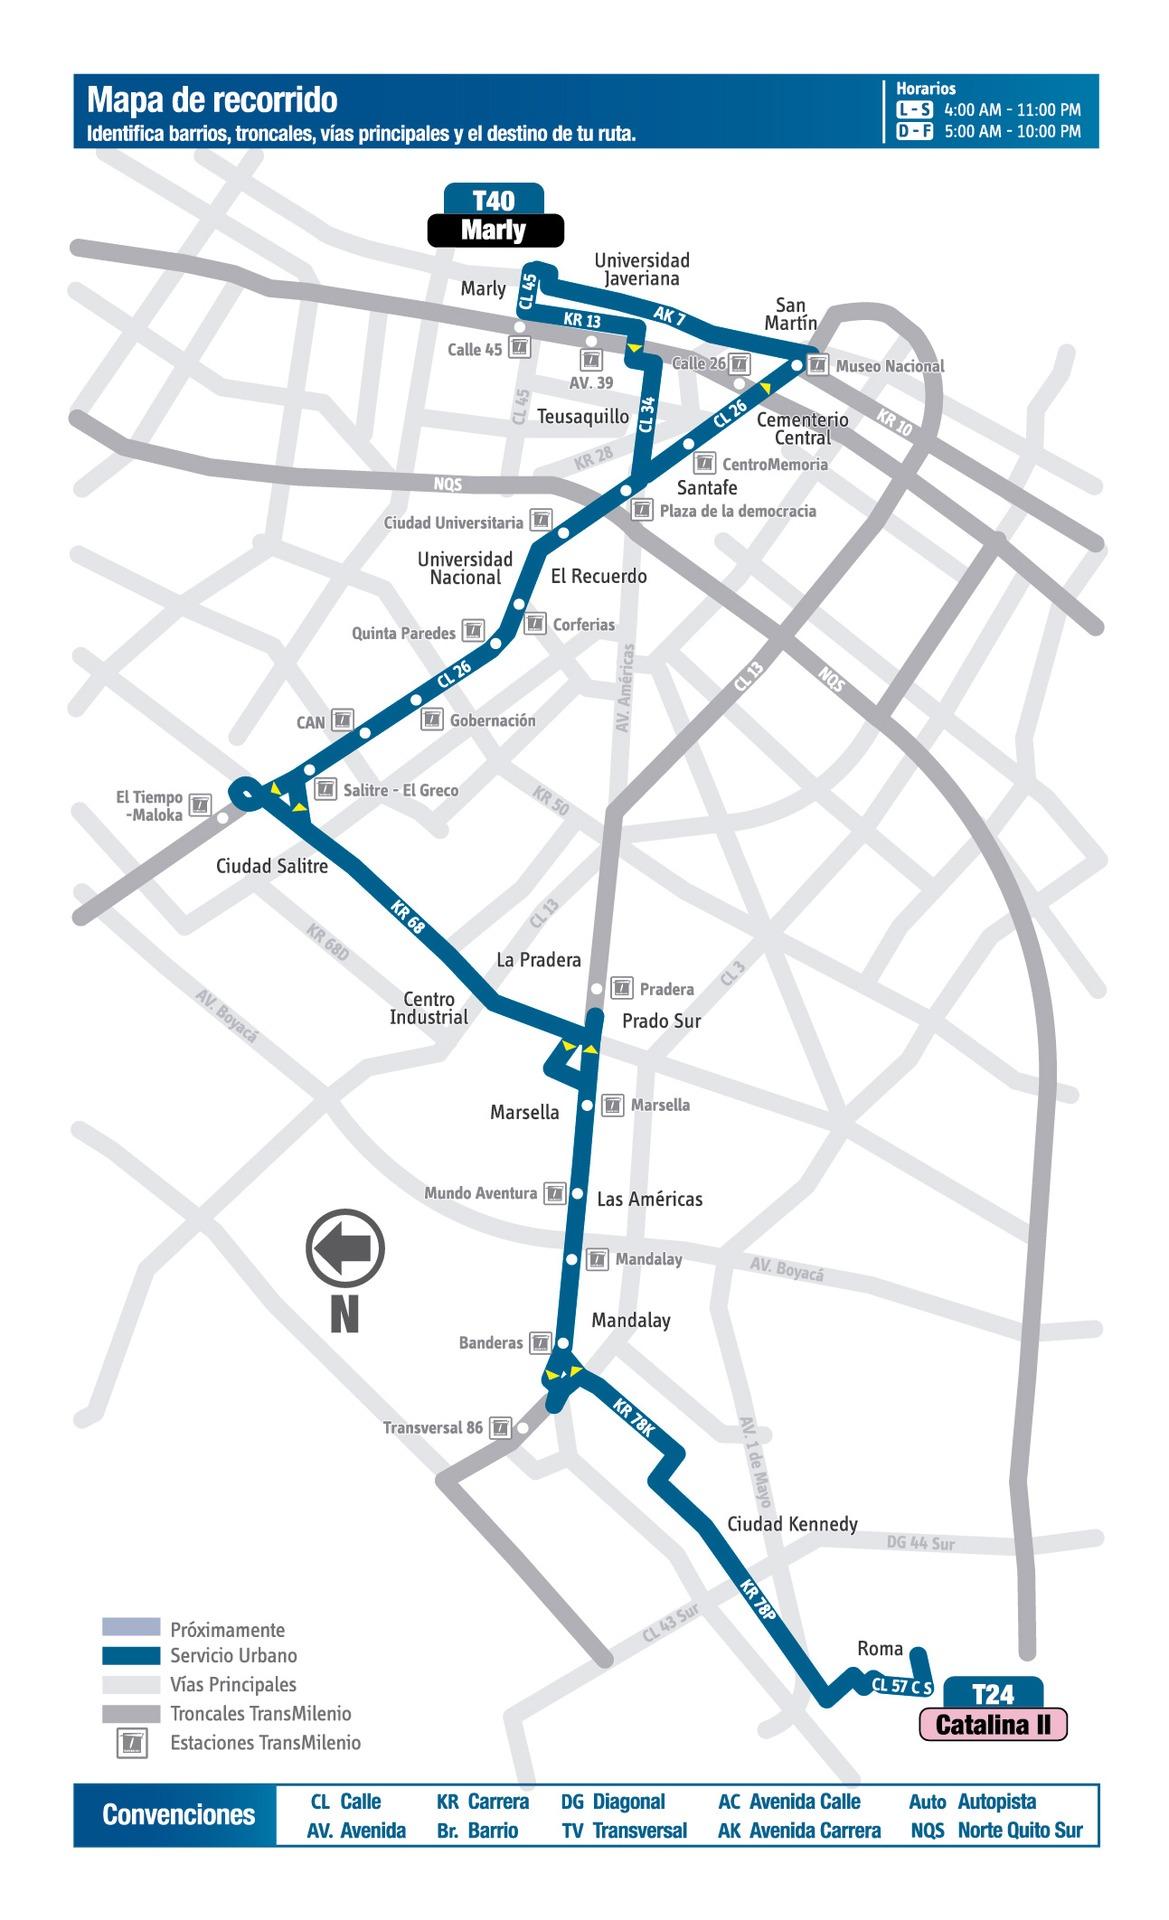 Ruta SITP: Ruta T40 - Catalina II ↔ Marly [Urbana] 2